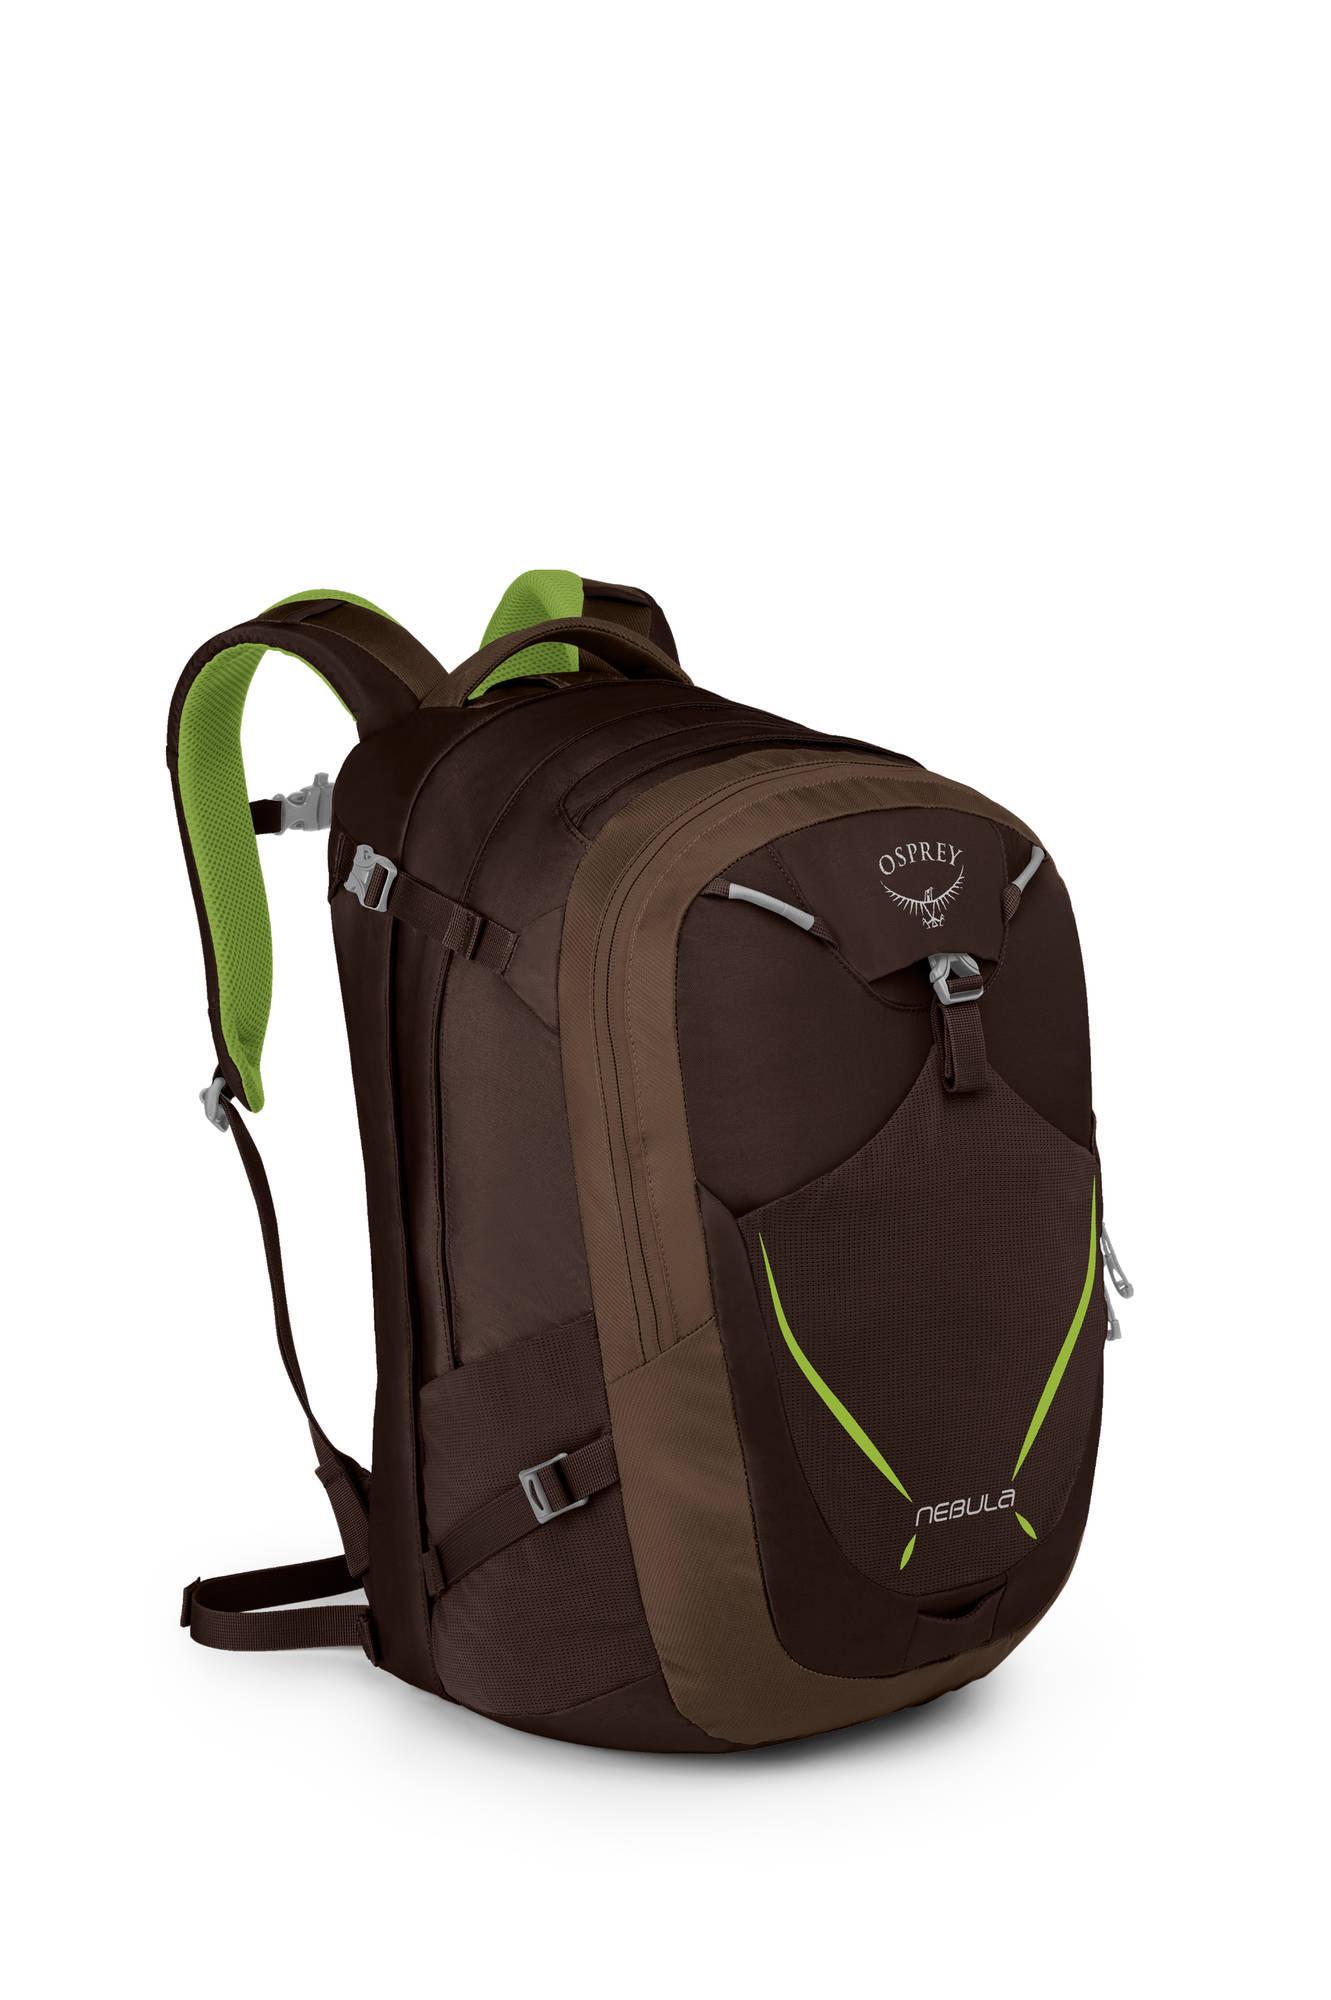 Городские рюкзаки Рюкзак городской Osprey Nebula 34 Komodo Green Nebula_34_Side_Komodo_Green_web.jpg